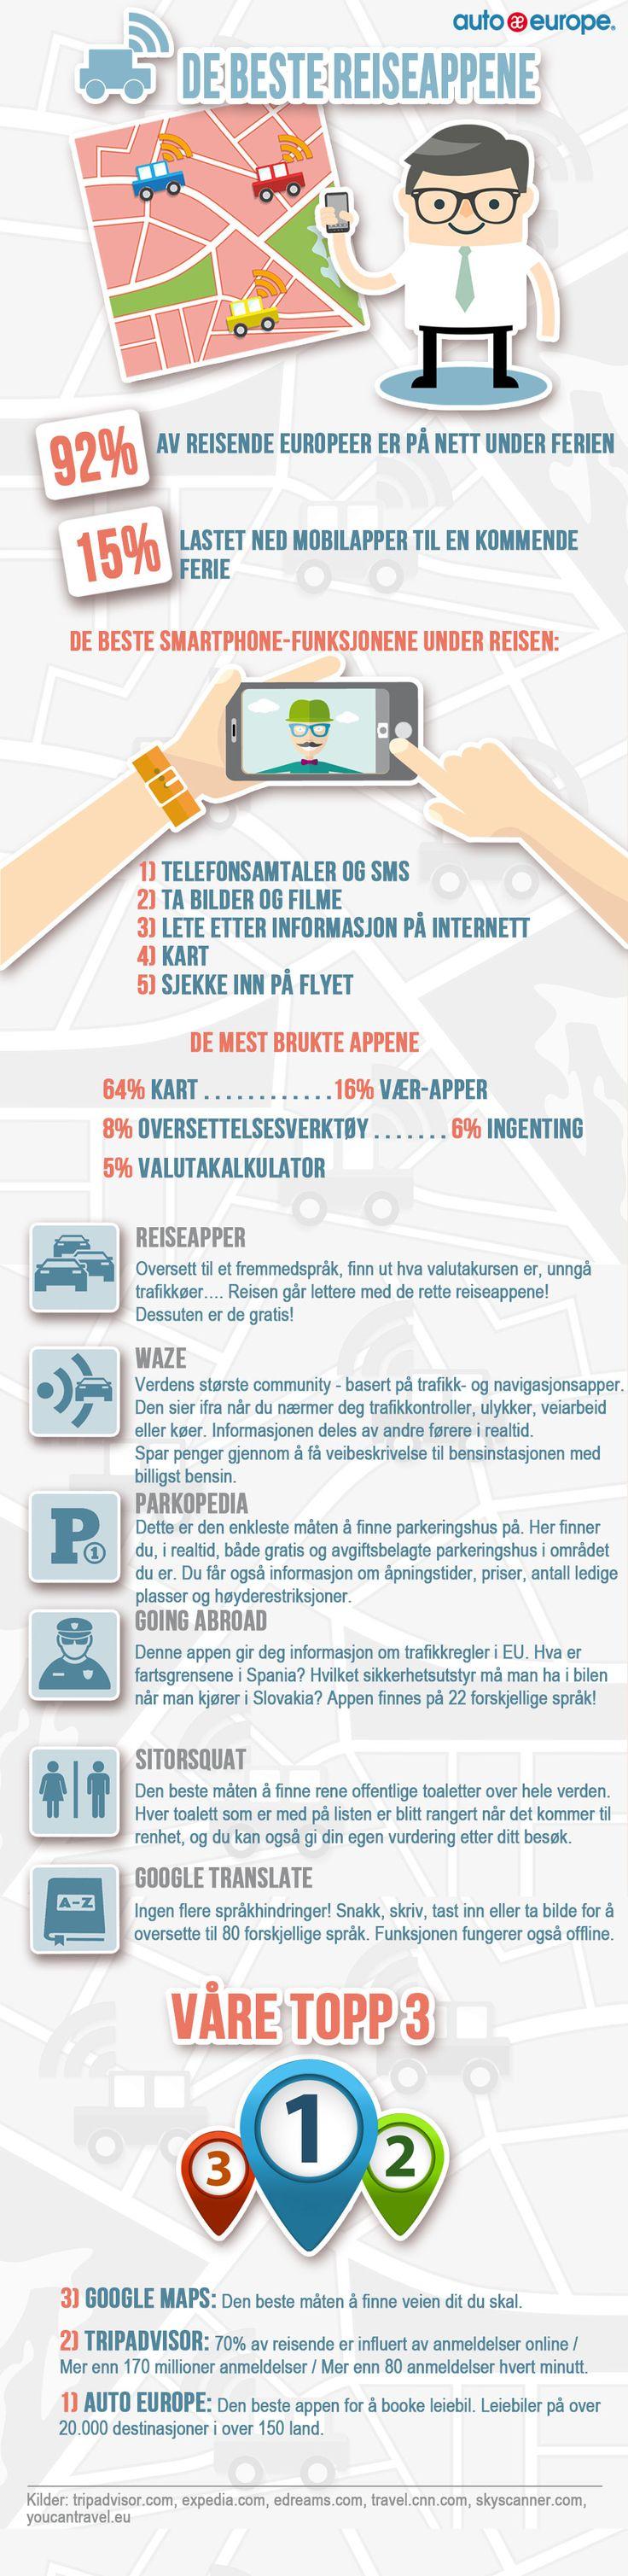 Mejores 25 imágenes de Auto Europe Infographics en Pinterest ...